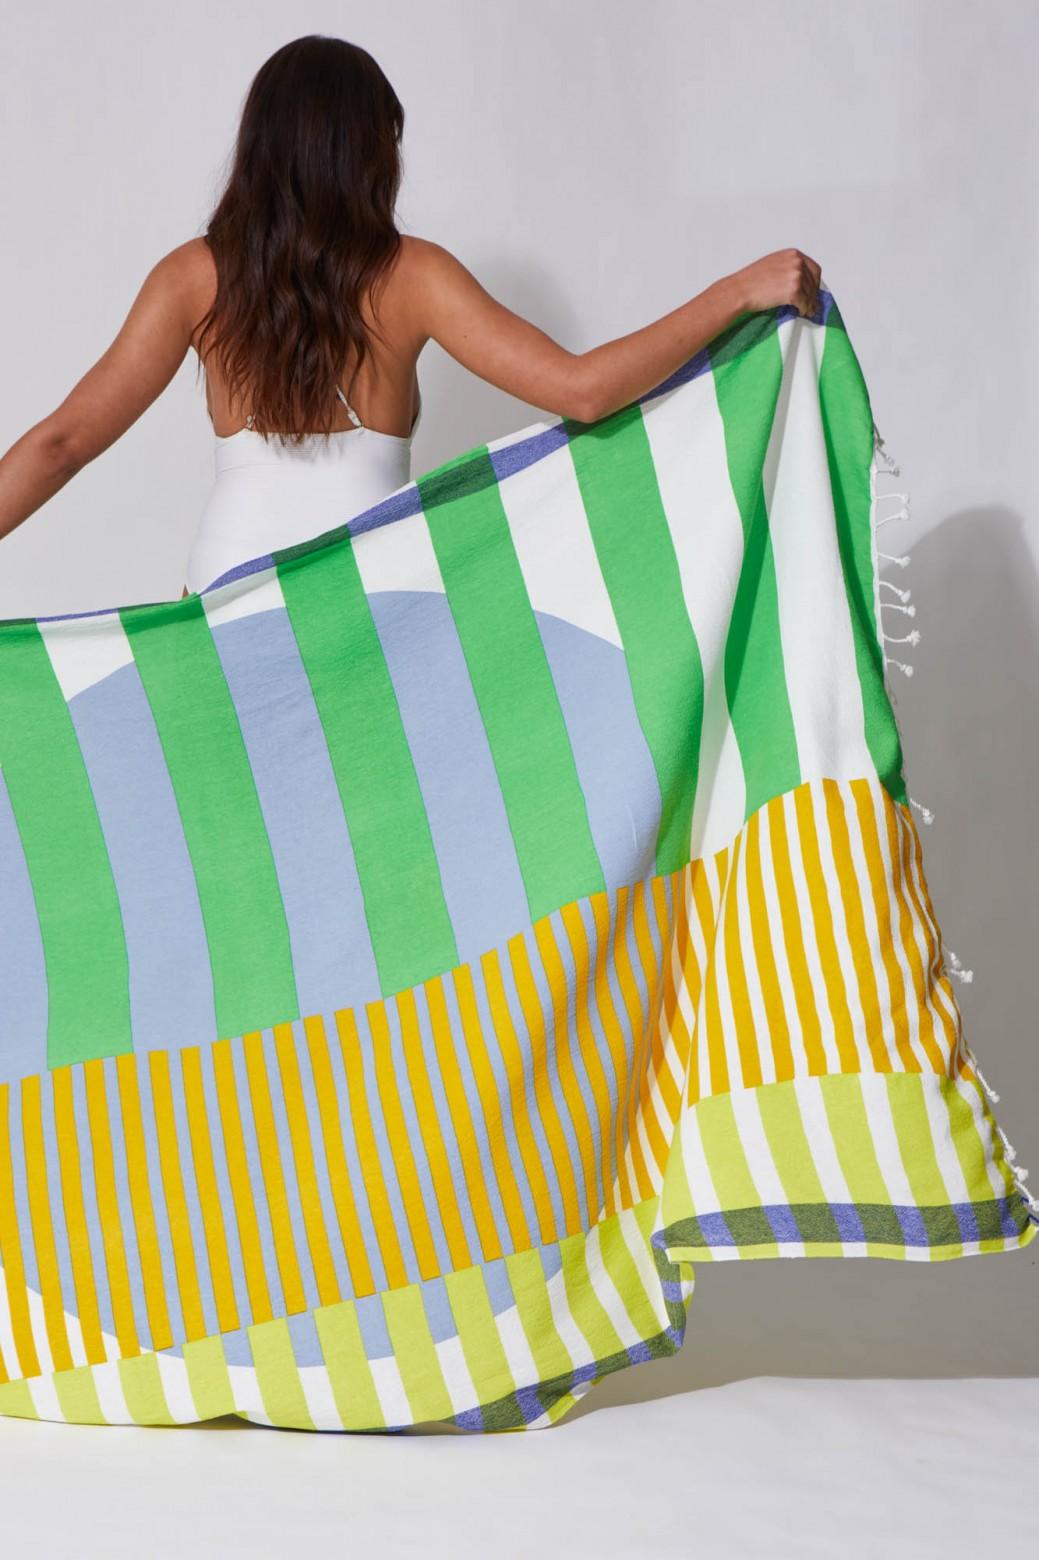 Sol Acid Beach Towel